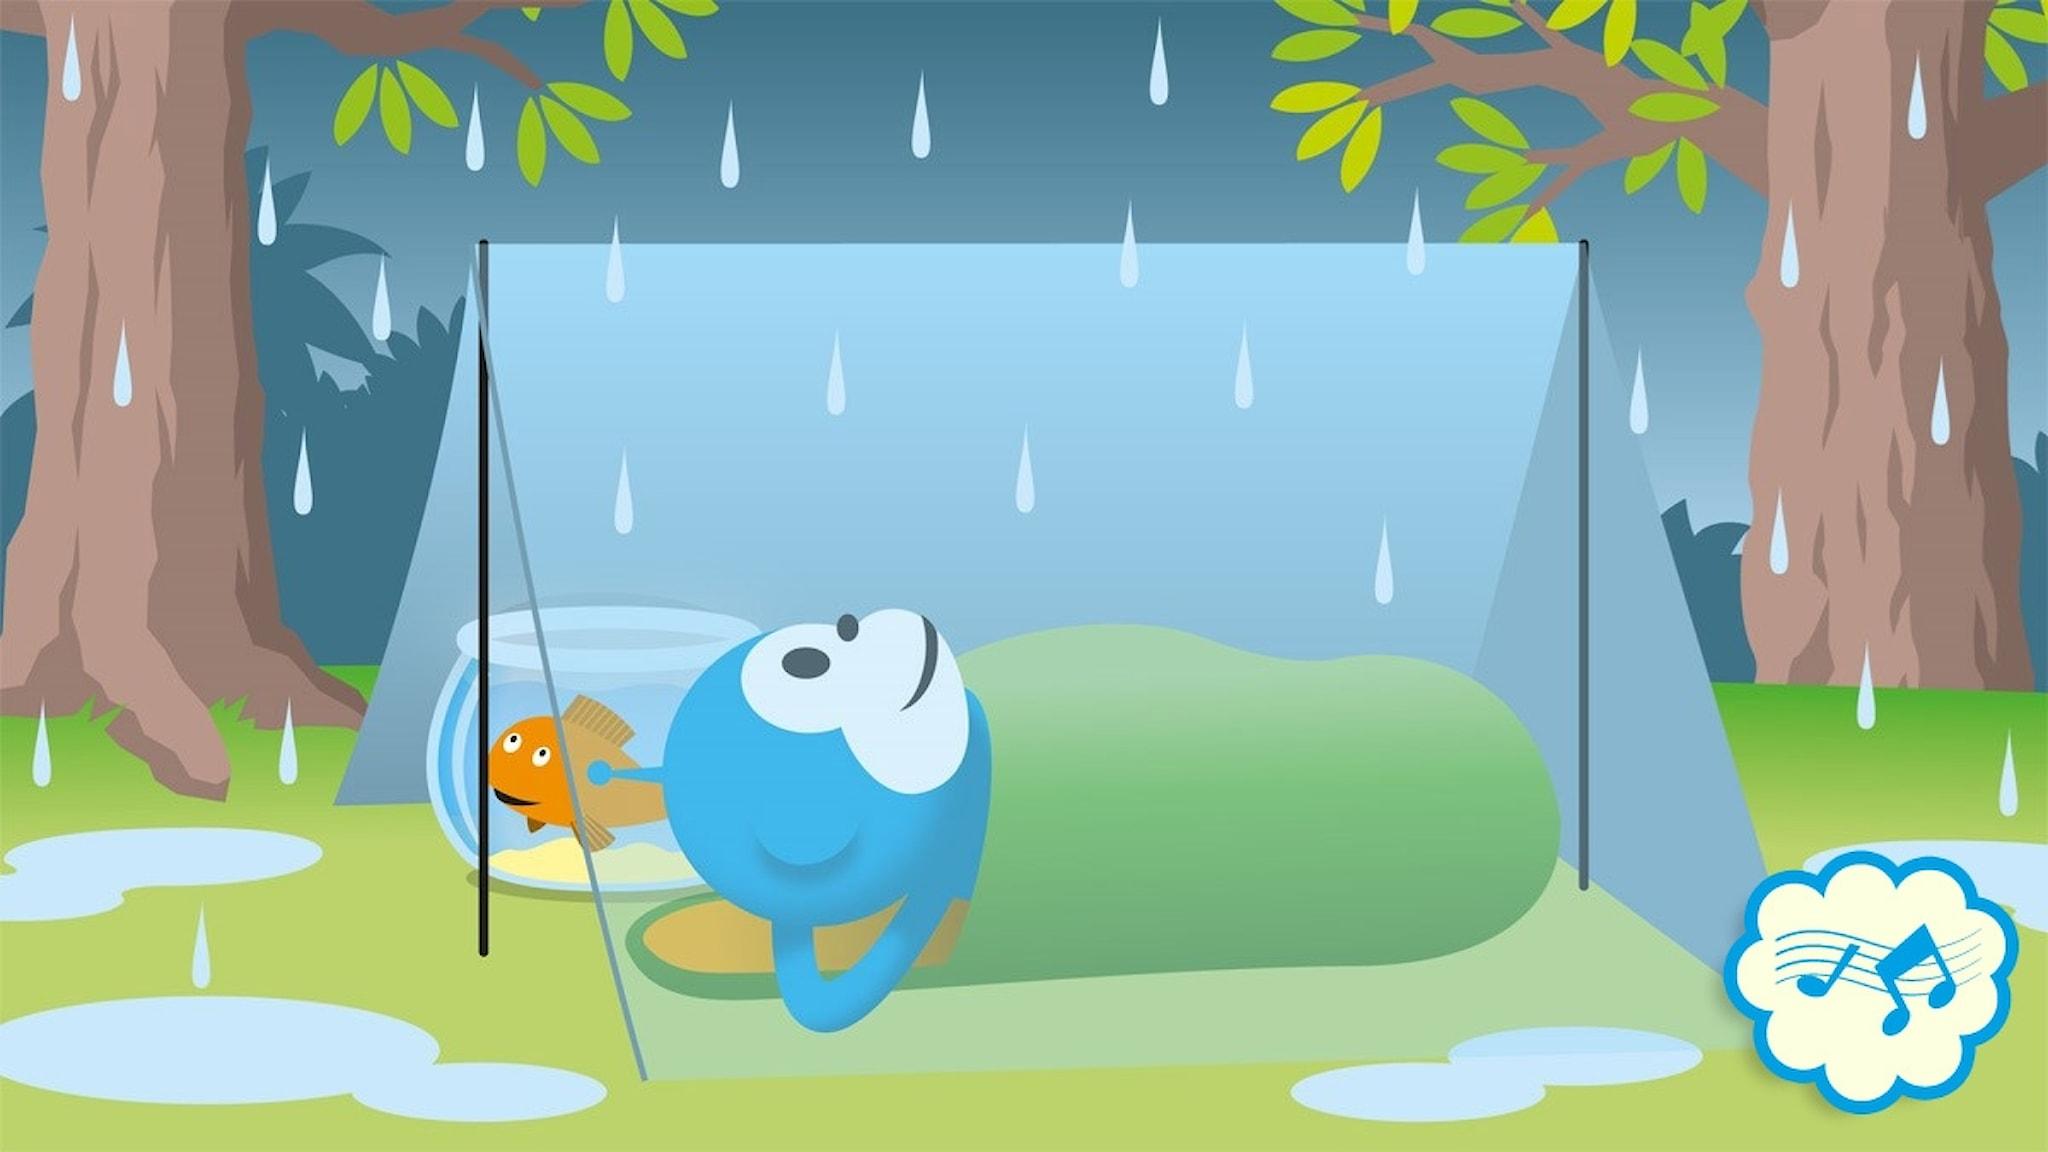 Radioapans vädersånger: Duggregn